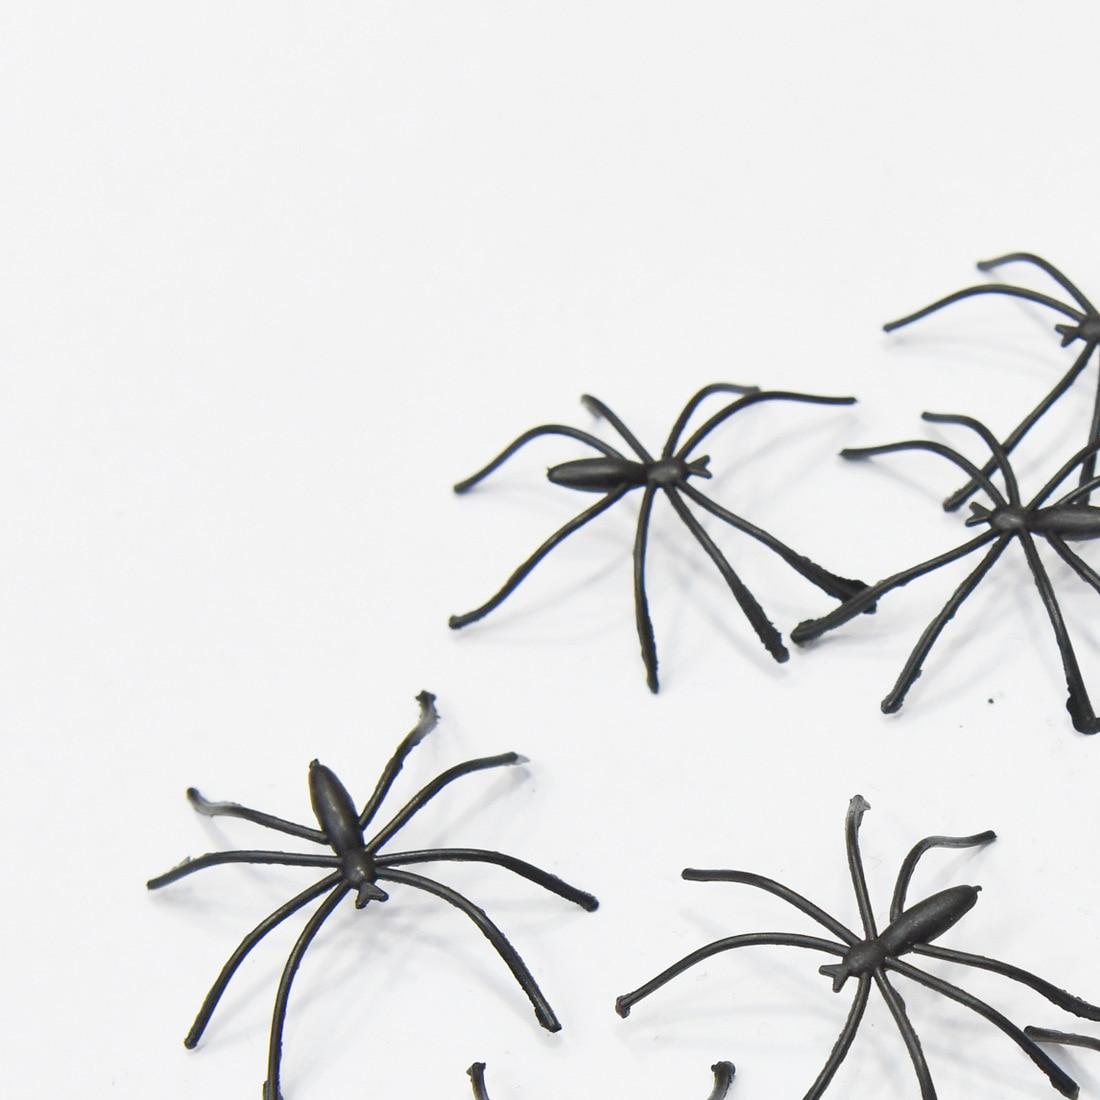 Home Modern 20pcs 4cm Halloween Plastic Black Spider Realistic Prank Joking Toys home Decoration Cheap